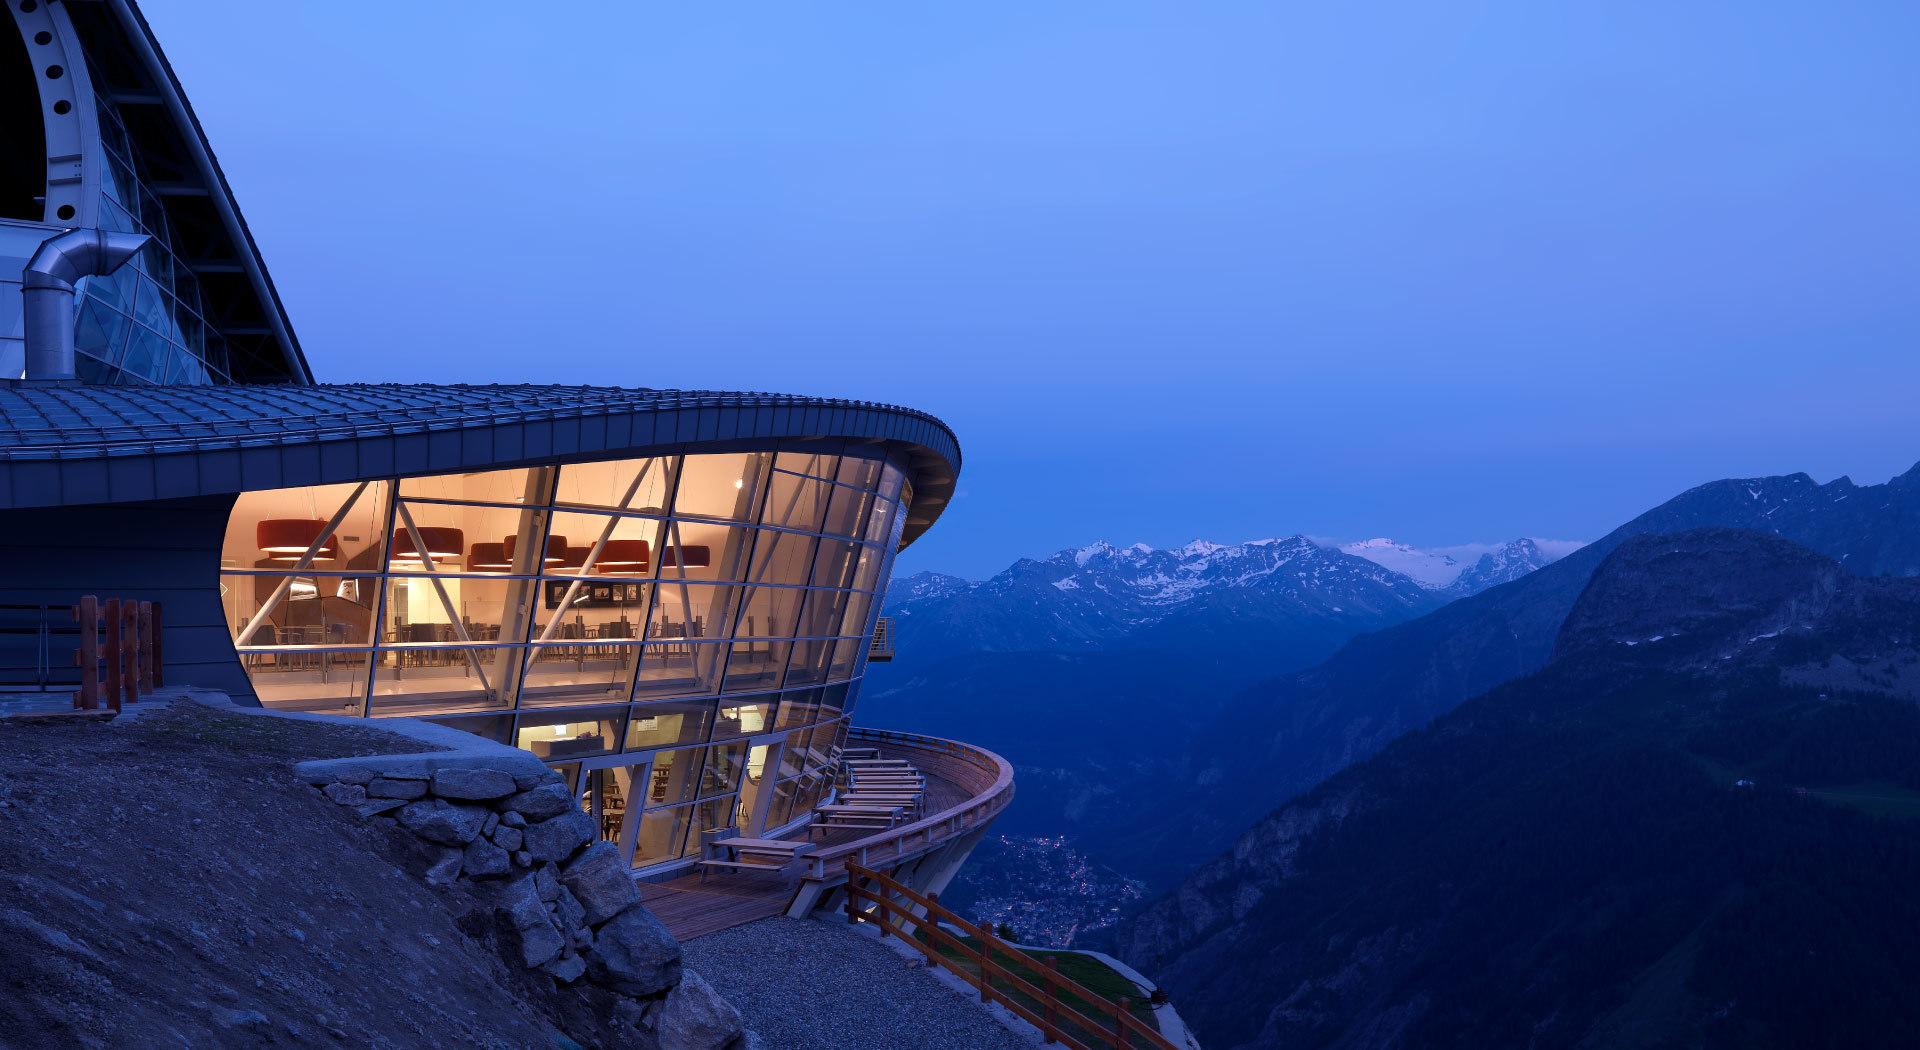 Skyway Monte Bianco, Punta Helbronner, Courmayeur. A Feltrinelli bookshop at an altitude of 3466: Europe's highest bookshop opens on Mont Blanc.